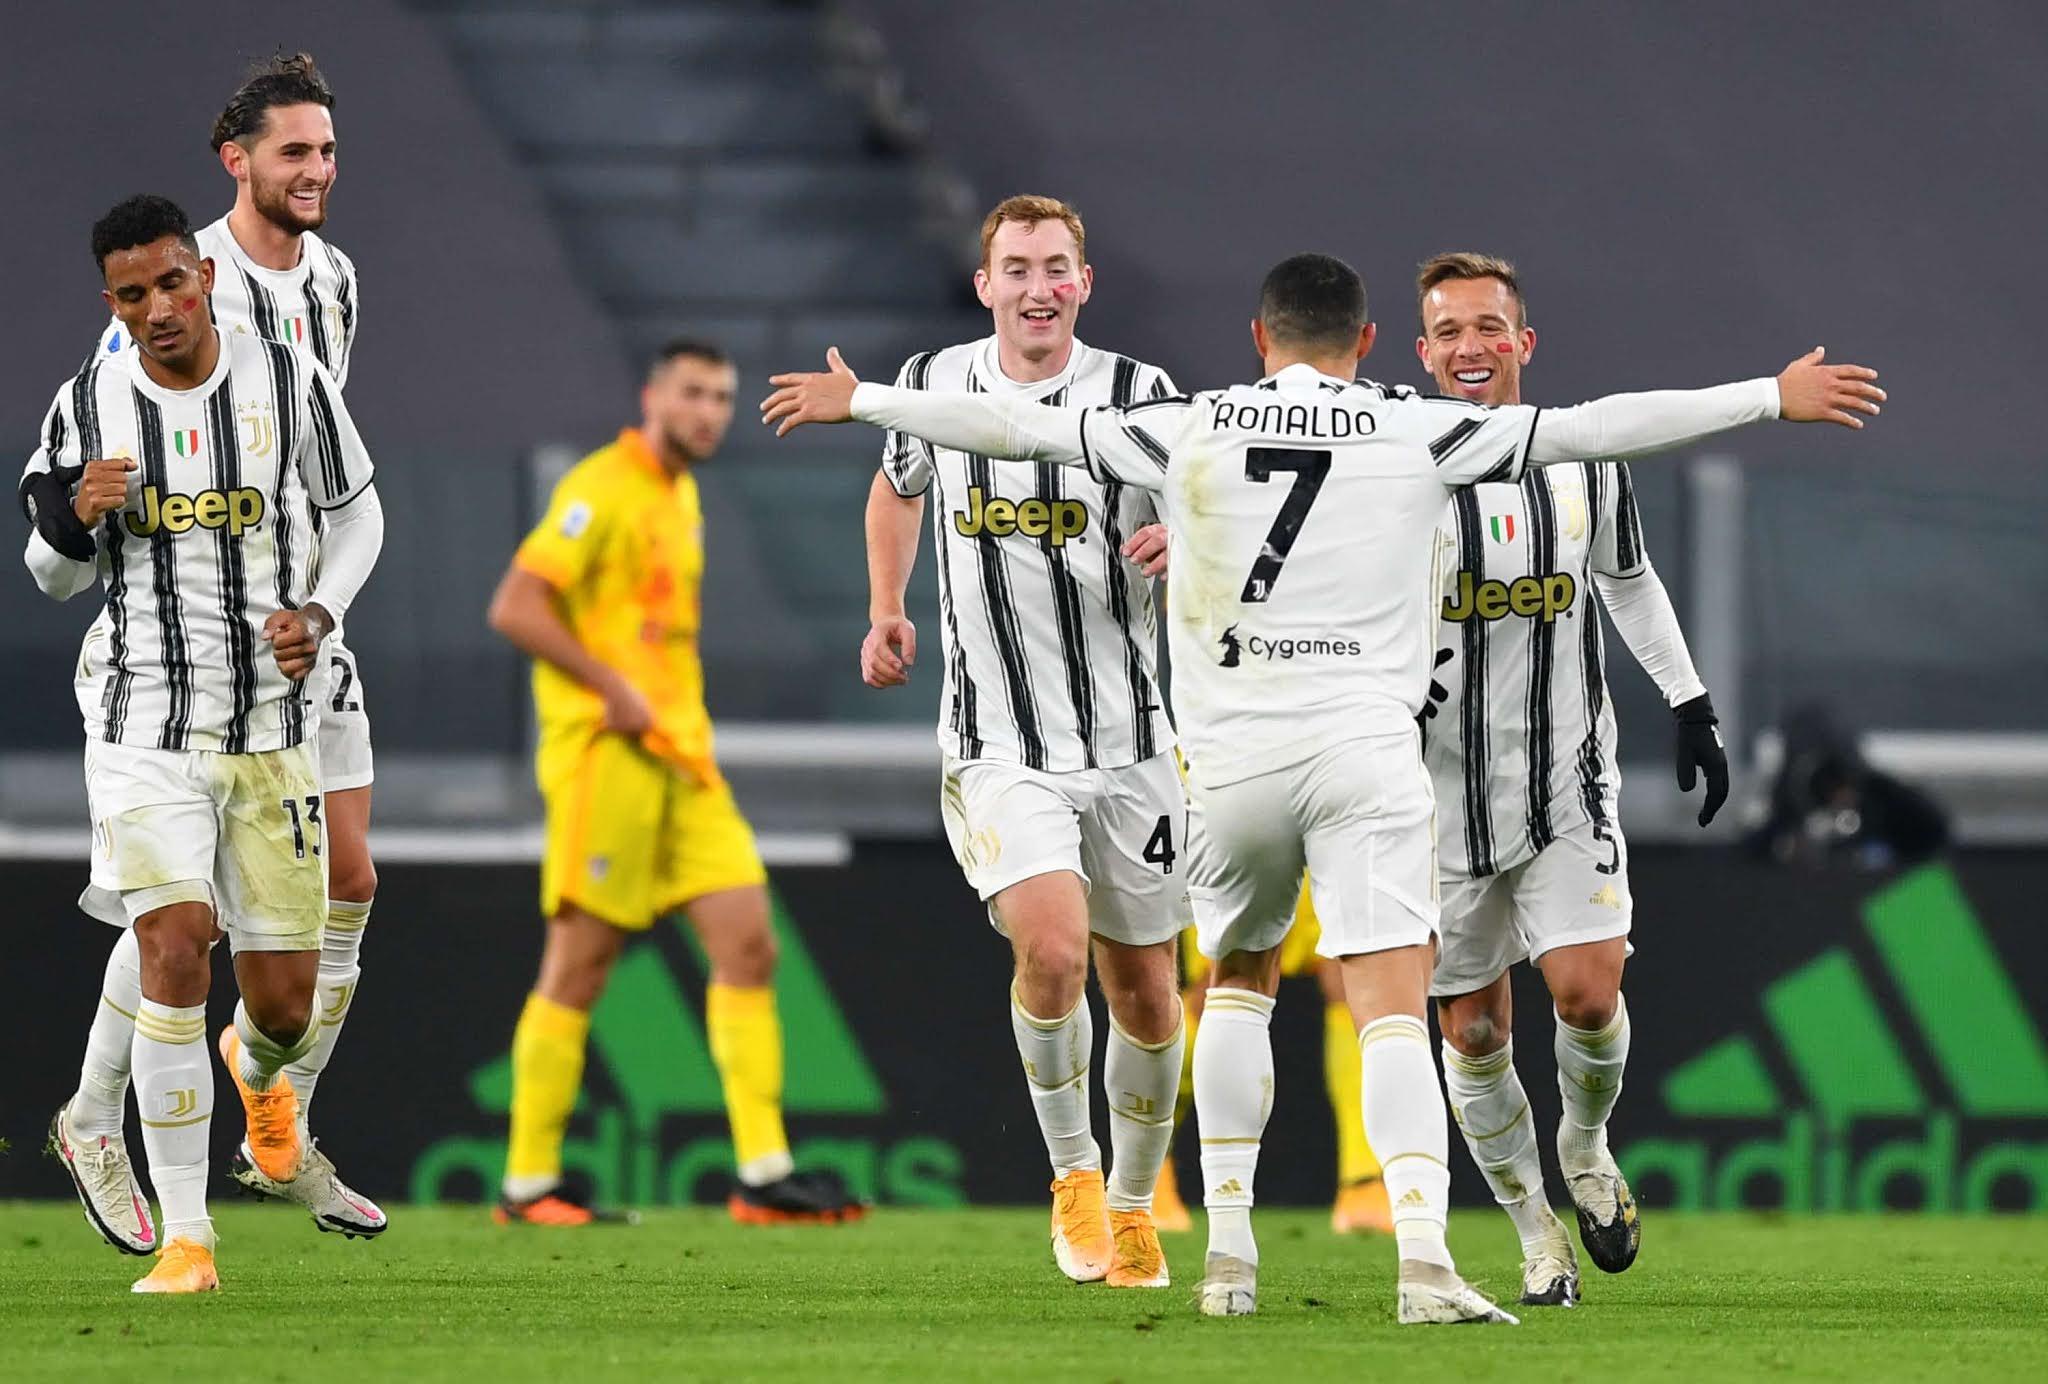 Juventus vs Cagliari resumen del partido